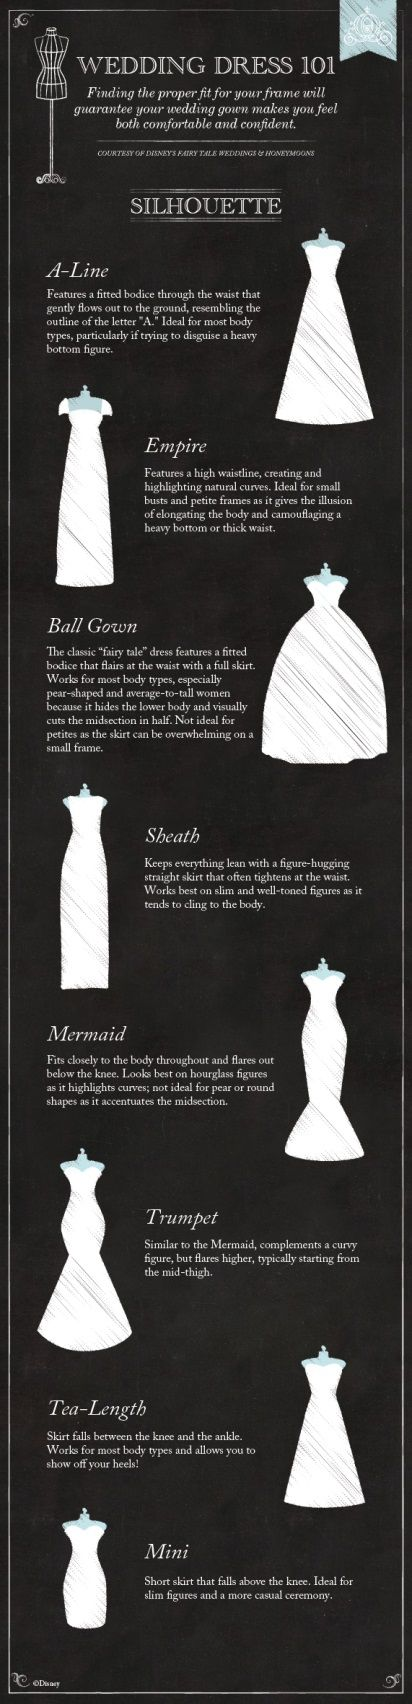 Wedding Dress 101 The Silhouette Disney wedding dress